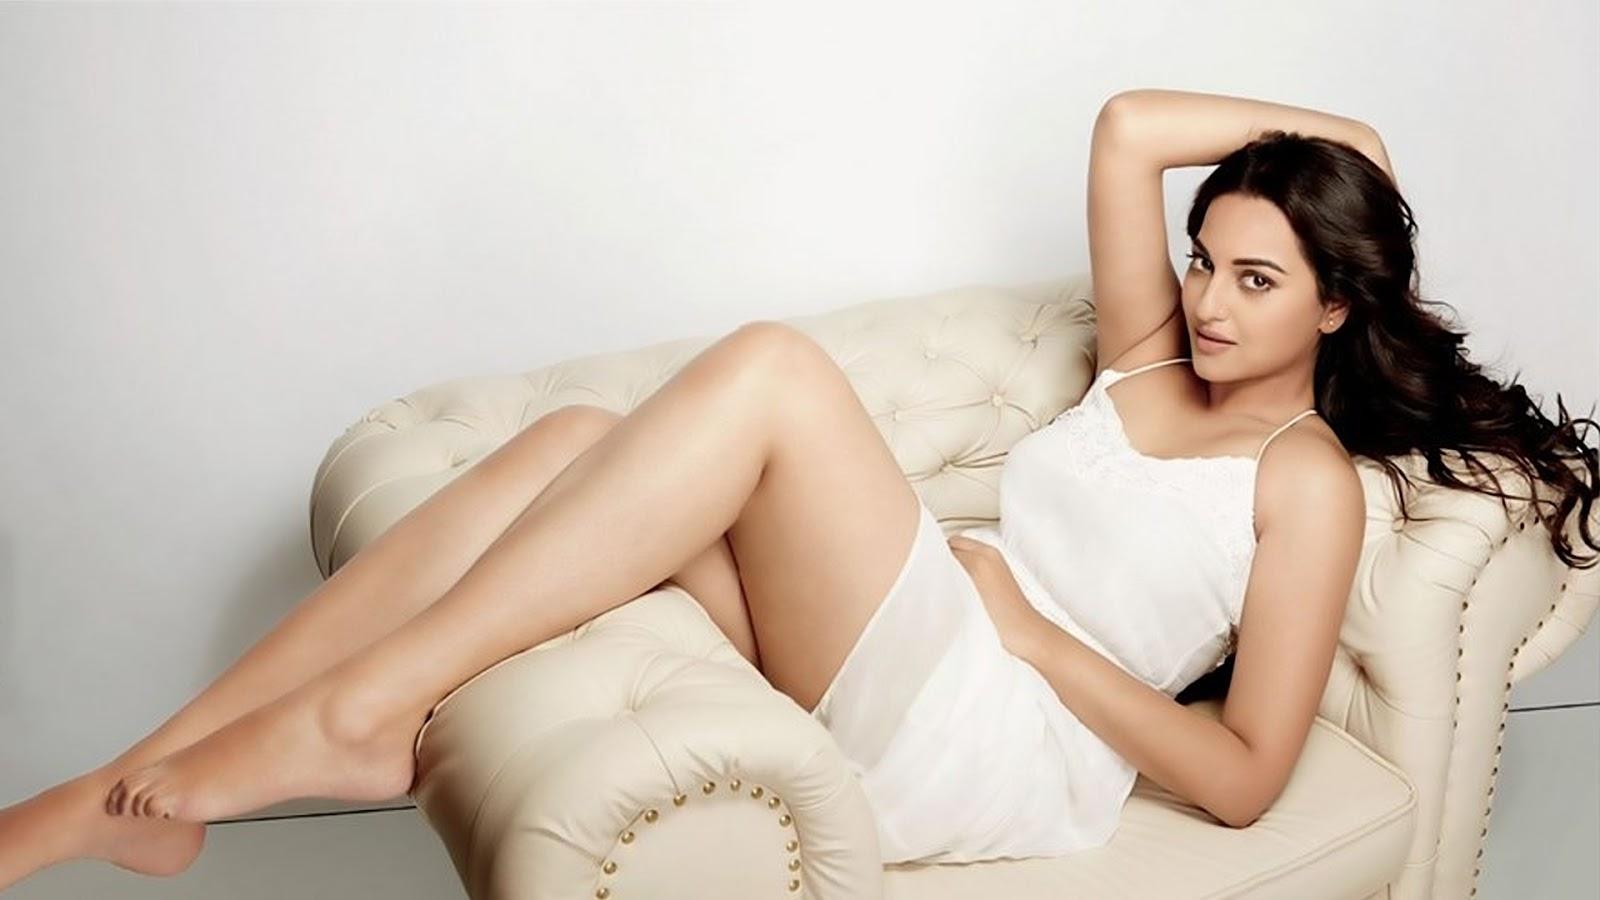 Nude Sonakshi Sinha Big Boobs Yellow Bra Nude Desi Actress